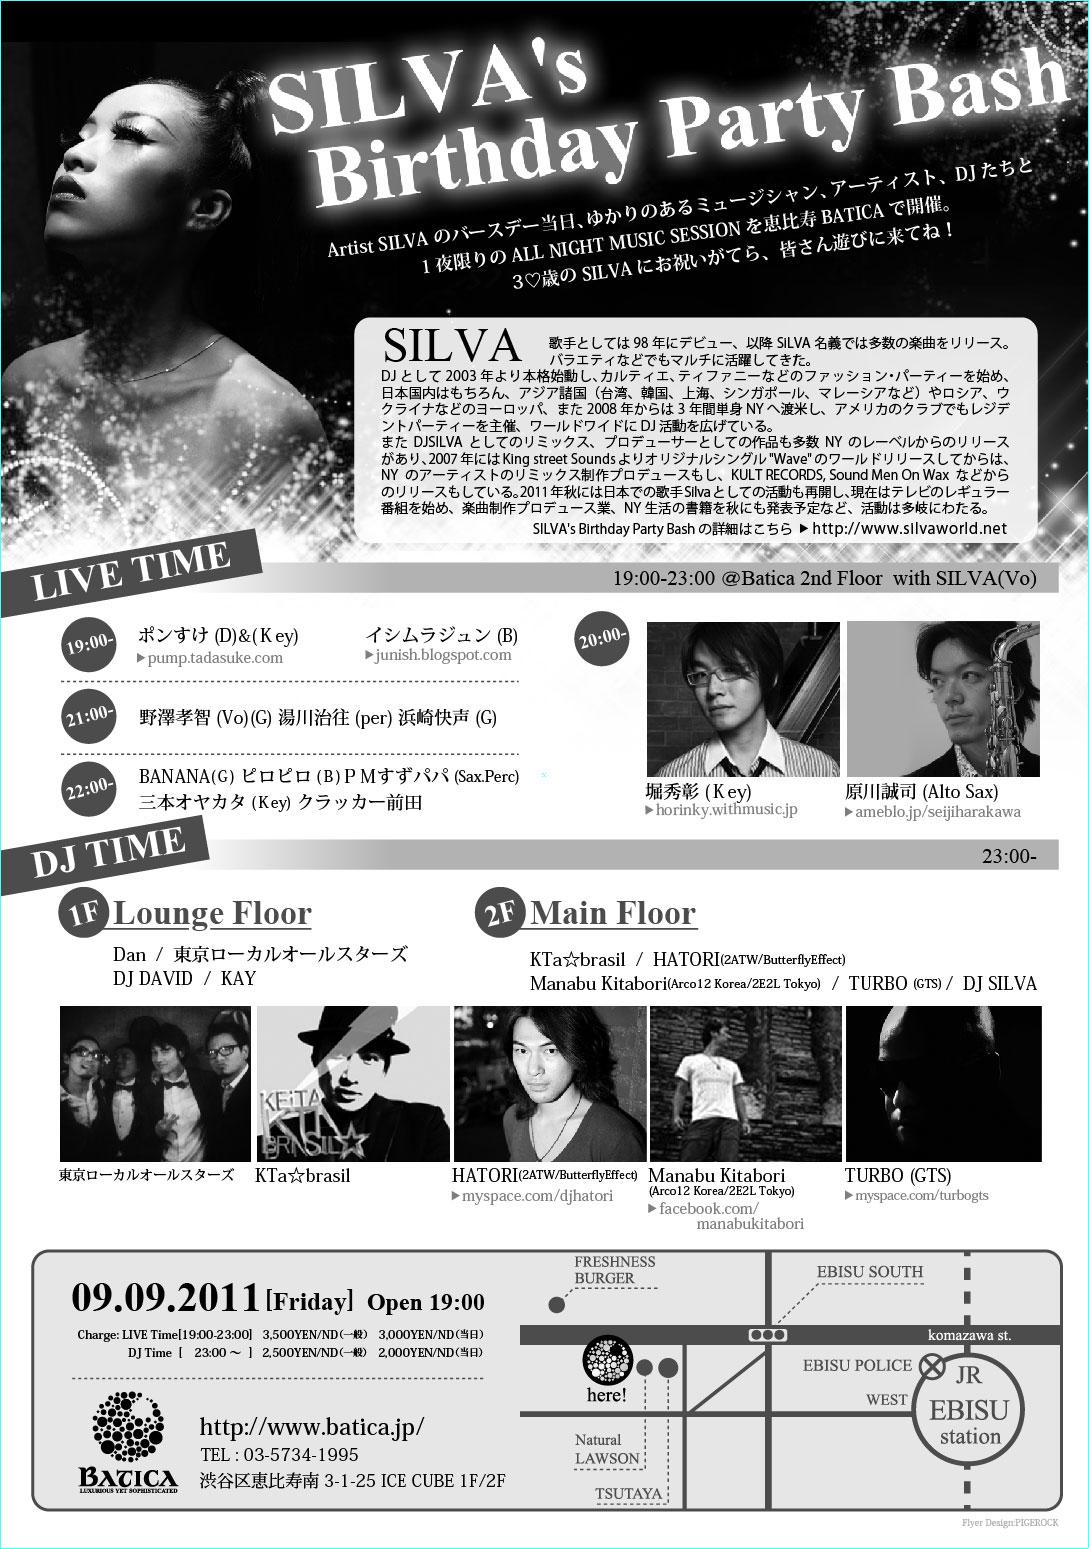 ☆9/9 FRI Tokyo @BaticaEbisu にて  ♥SILVA @silvaworld BIRTHDAY PARTY♥ に出演♬_b0032617_1222812.jpg